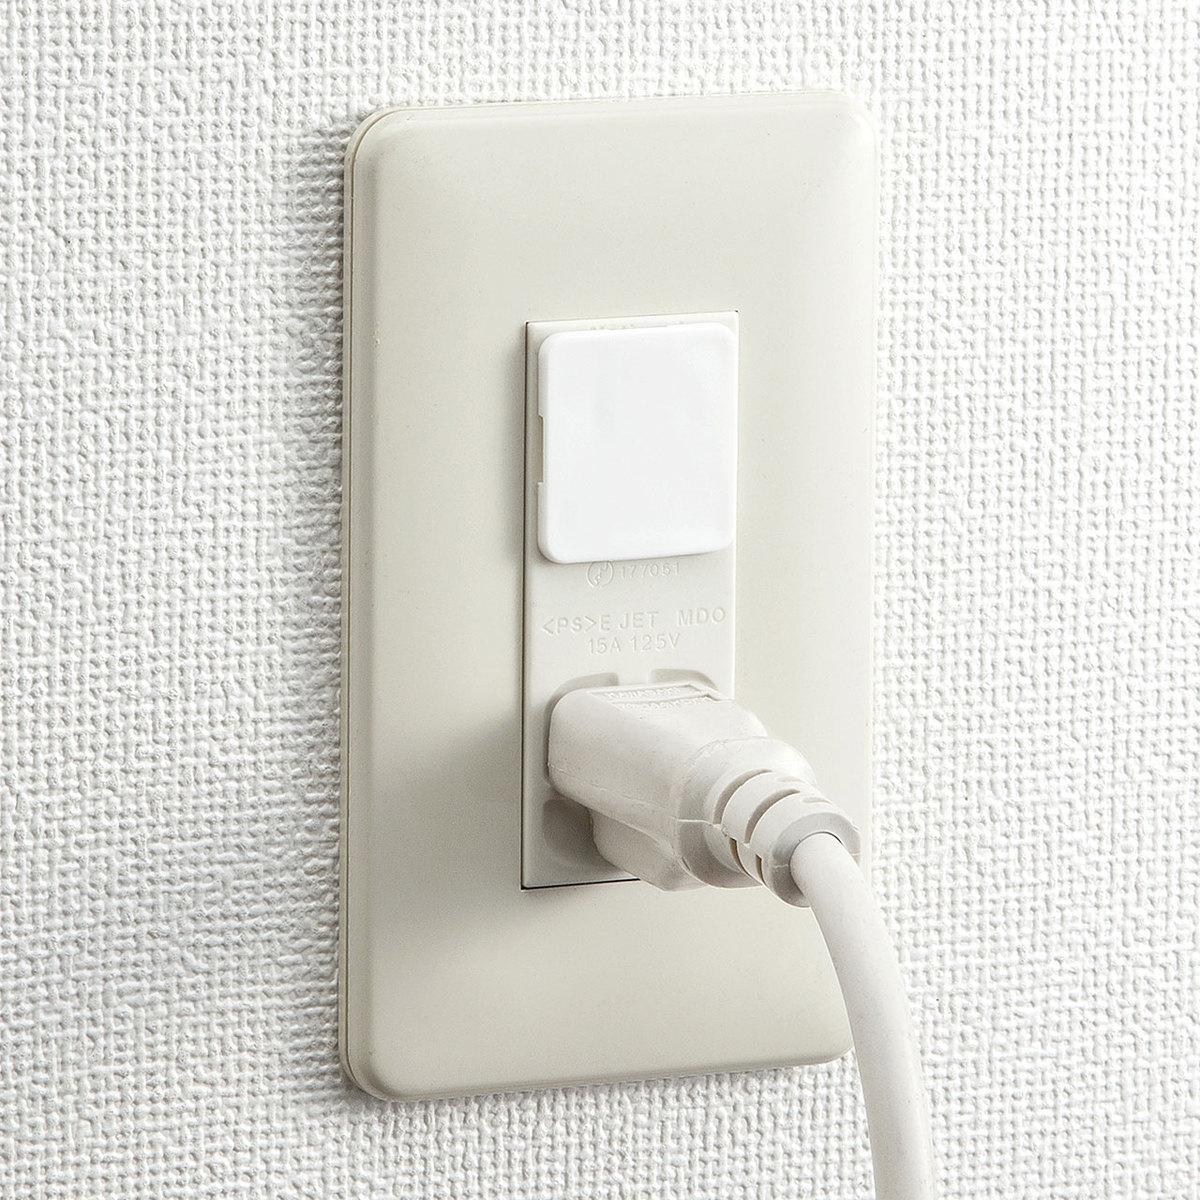 [TAP-CAP3P100] コンセント安全キャップ(3P用・100個入・ホワイト)